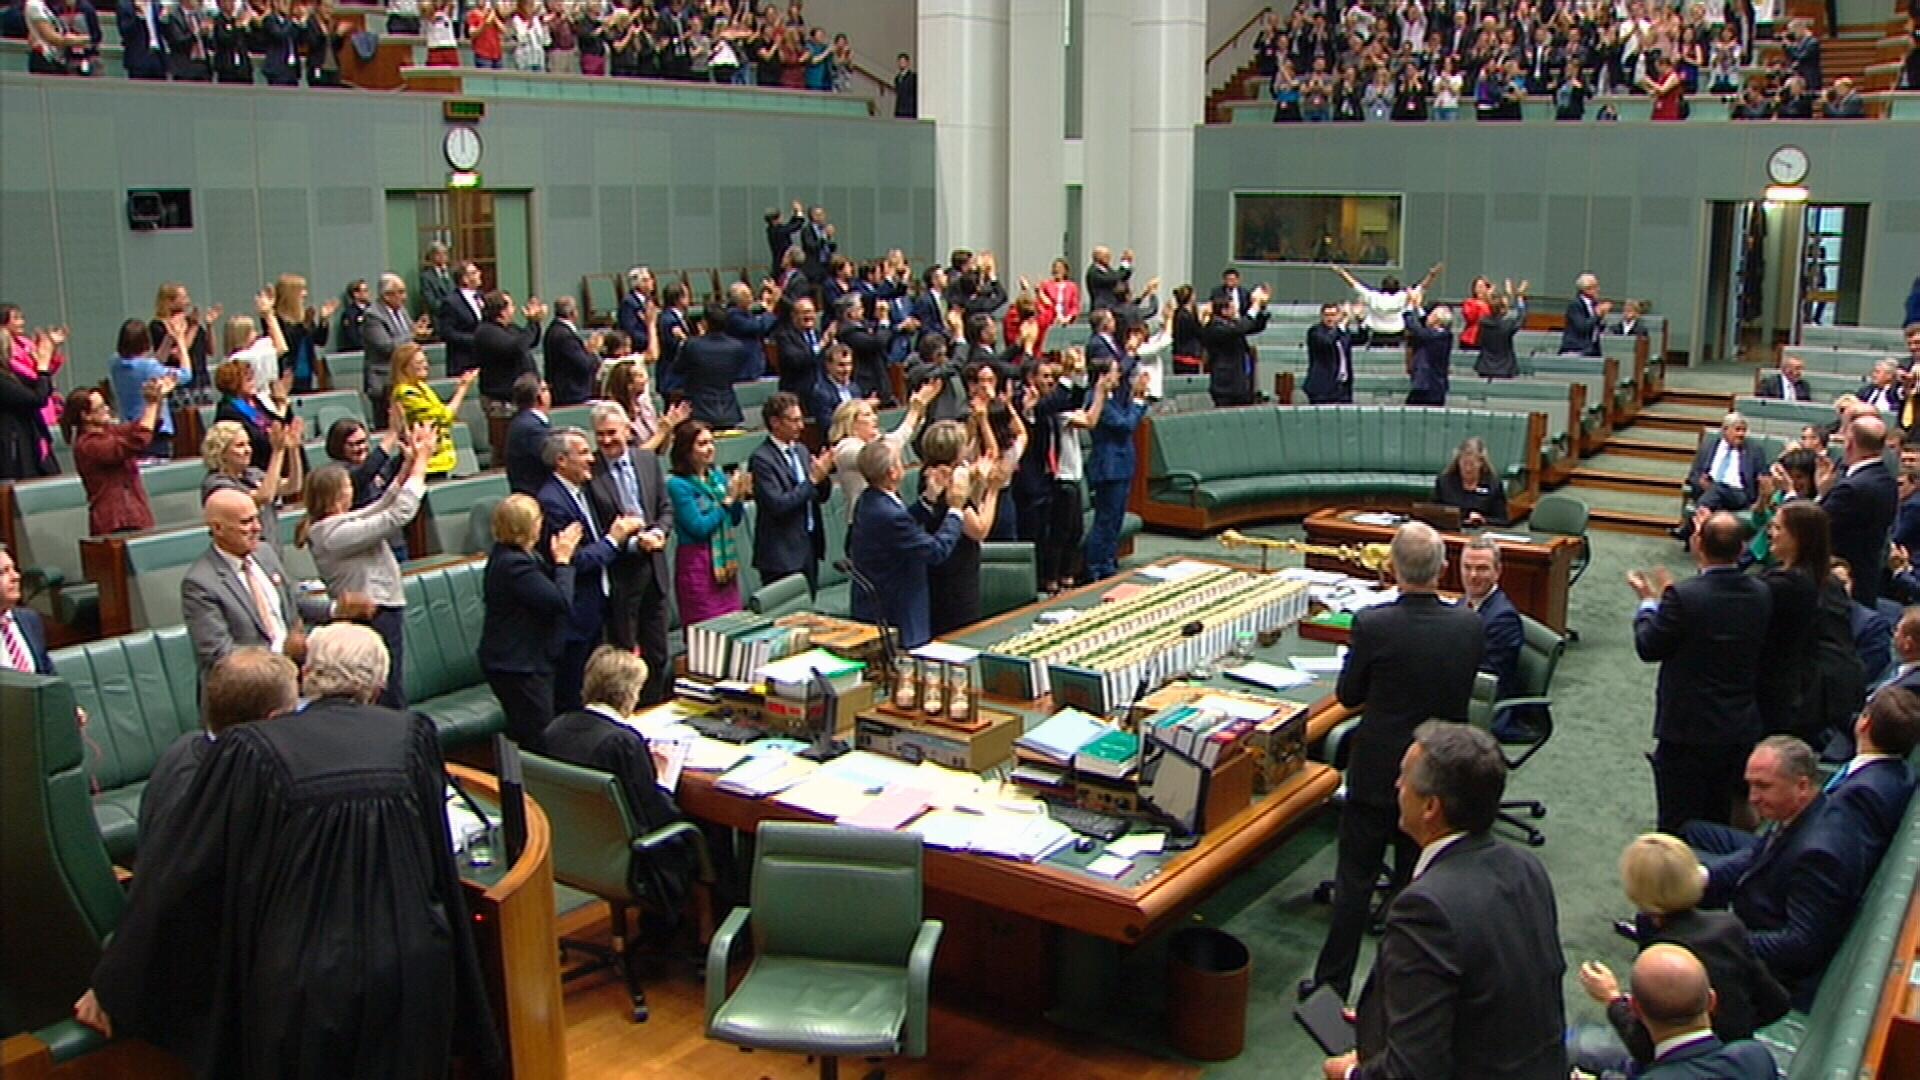 Same-sex marriage bill passes parliament